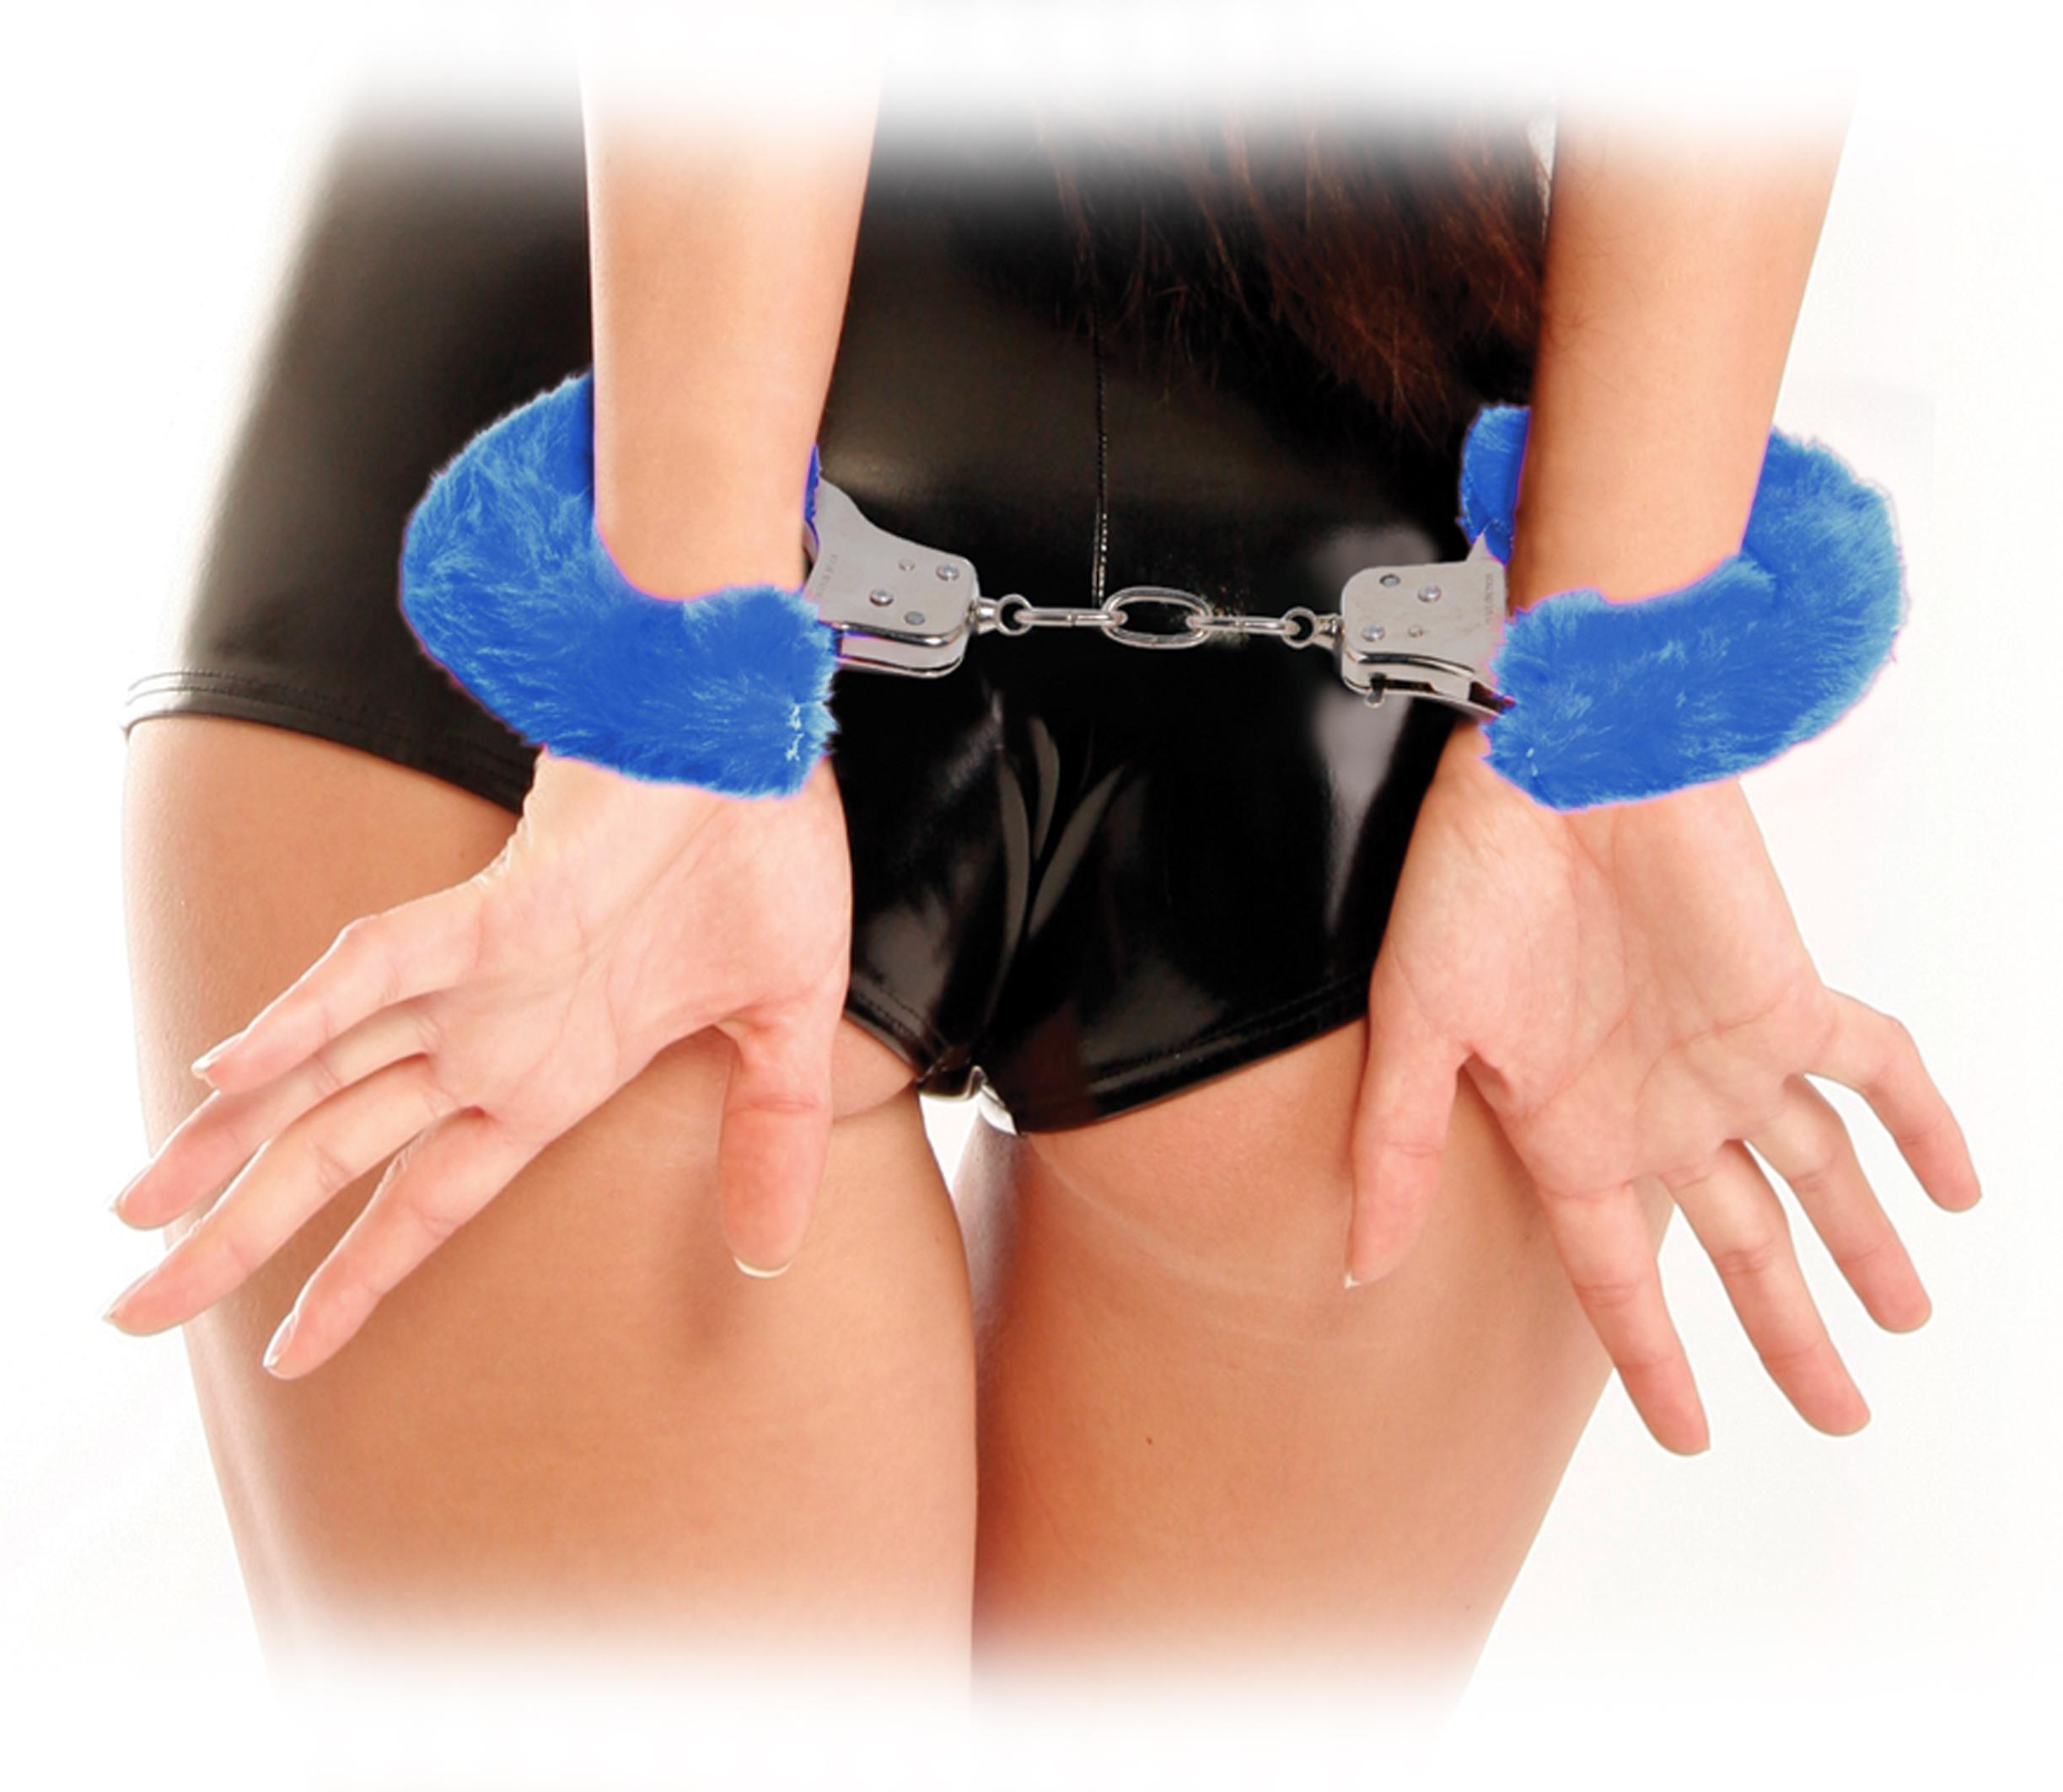 Фото секс з наручниками 18 фотография